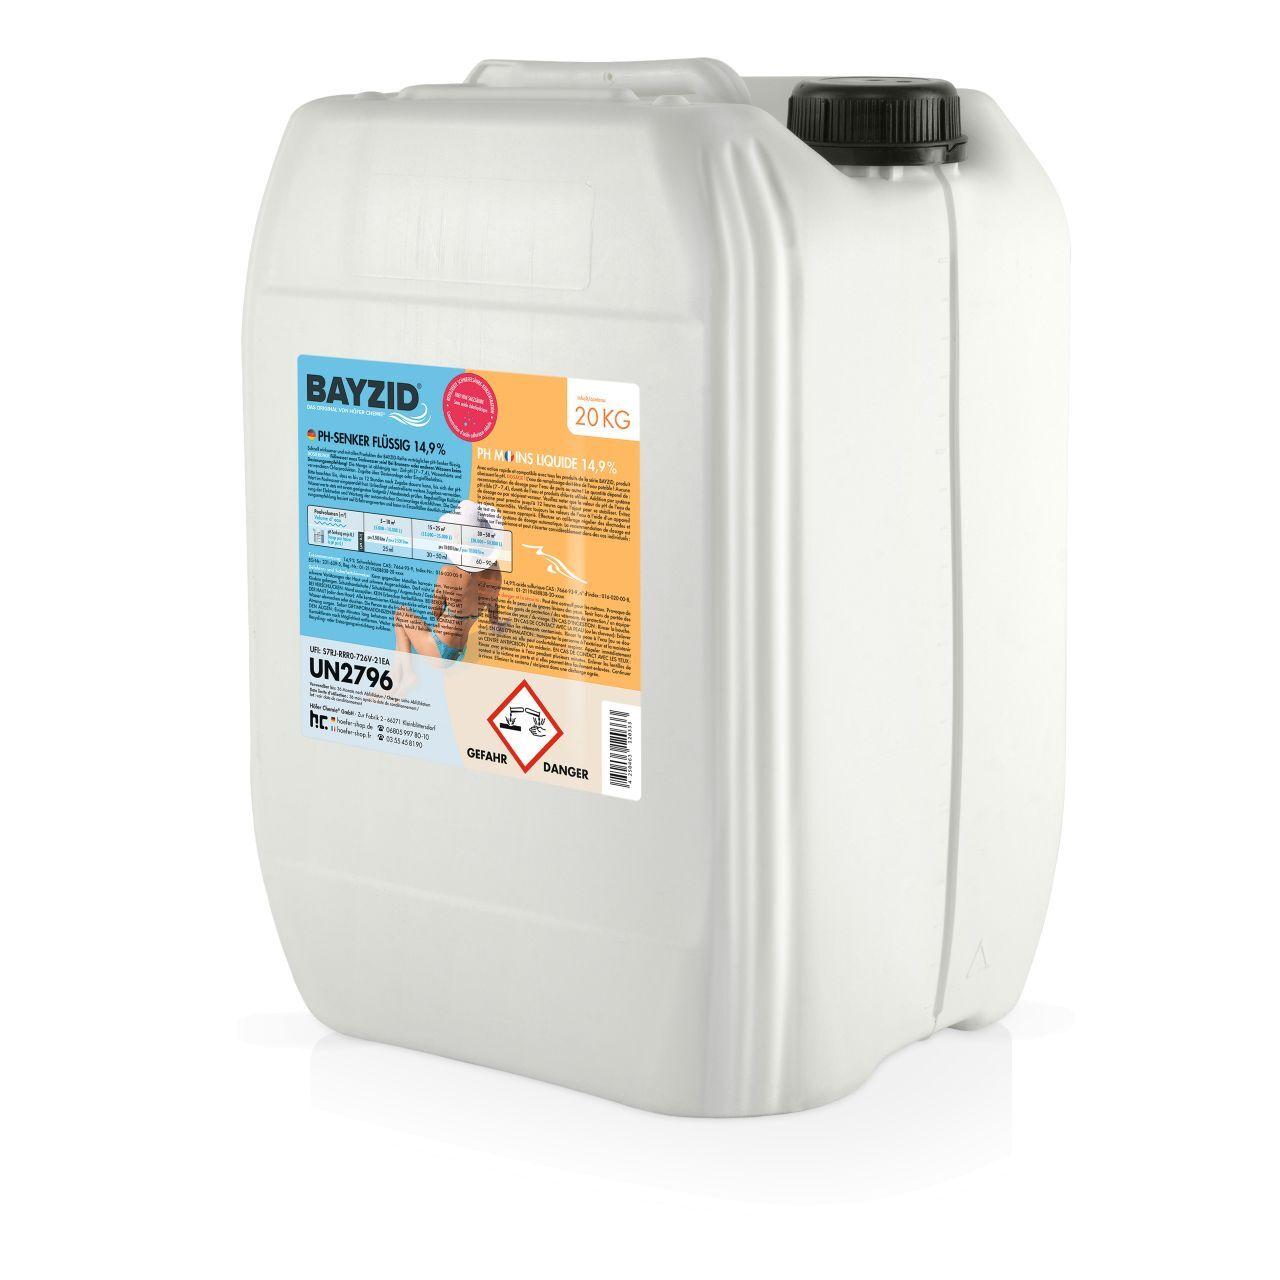 BAYZID 80 kg pH moins liquide (4 x 20 kg)